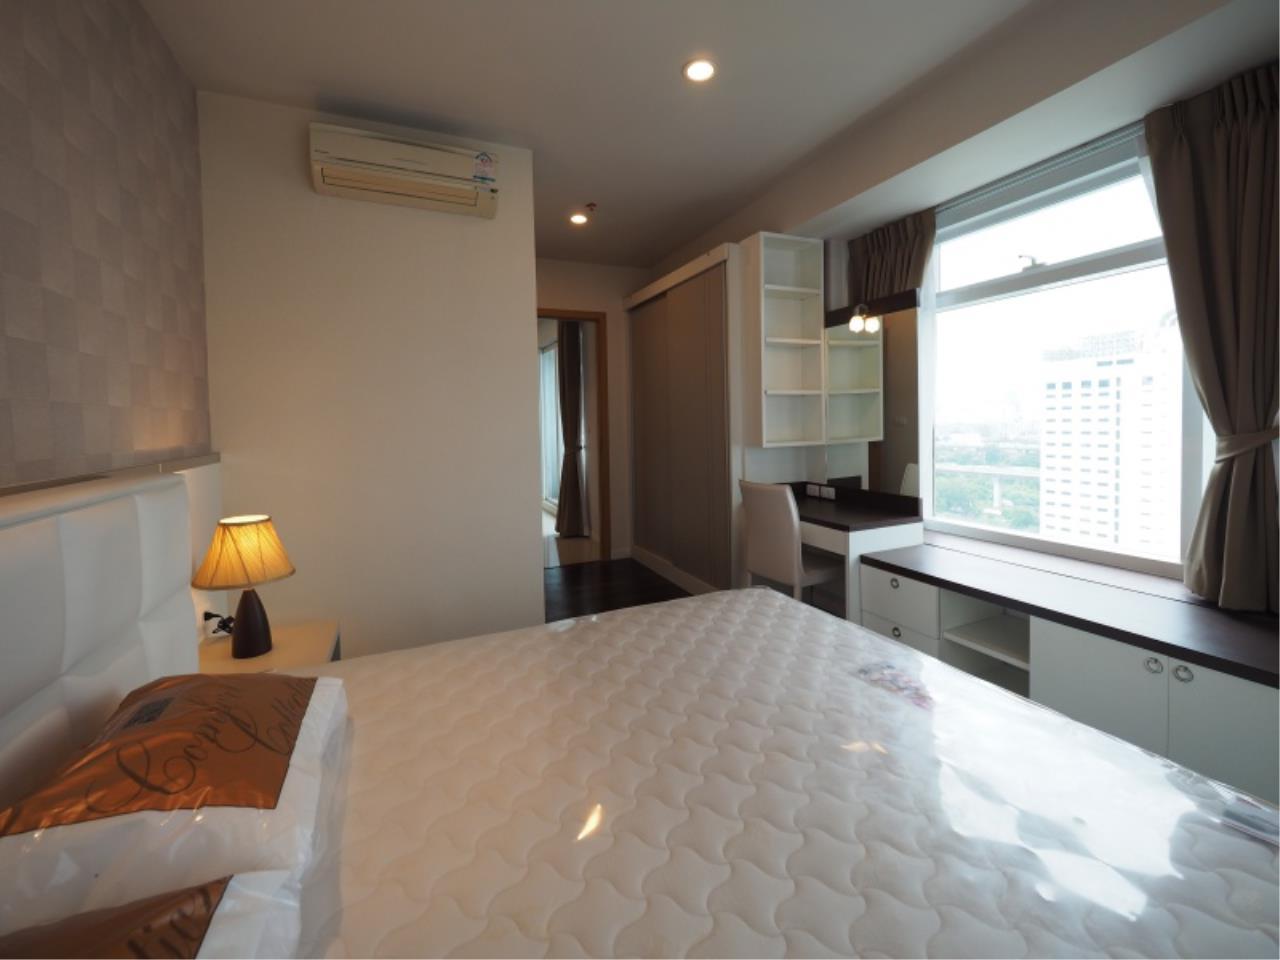 Century21 Skylux Agency's Circle Condominium / Condo For Rent / 1 Bedroom / 46 SQM / MRT Phetchaburi / Bangkok 4